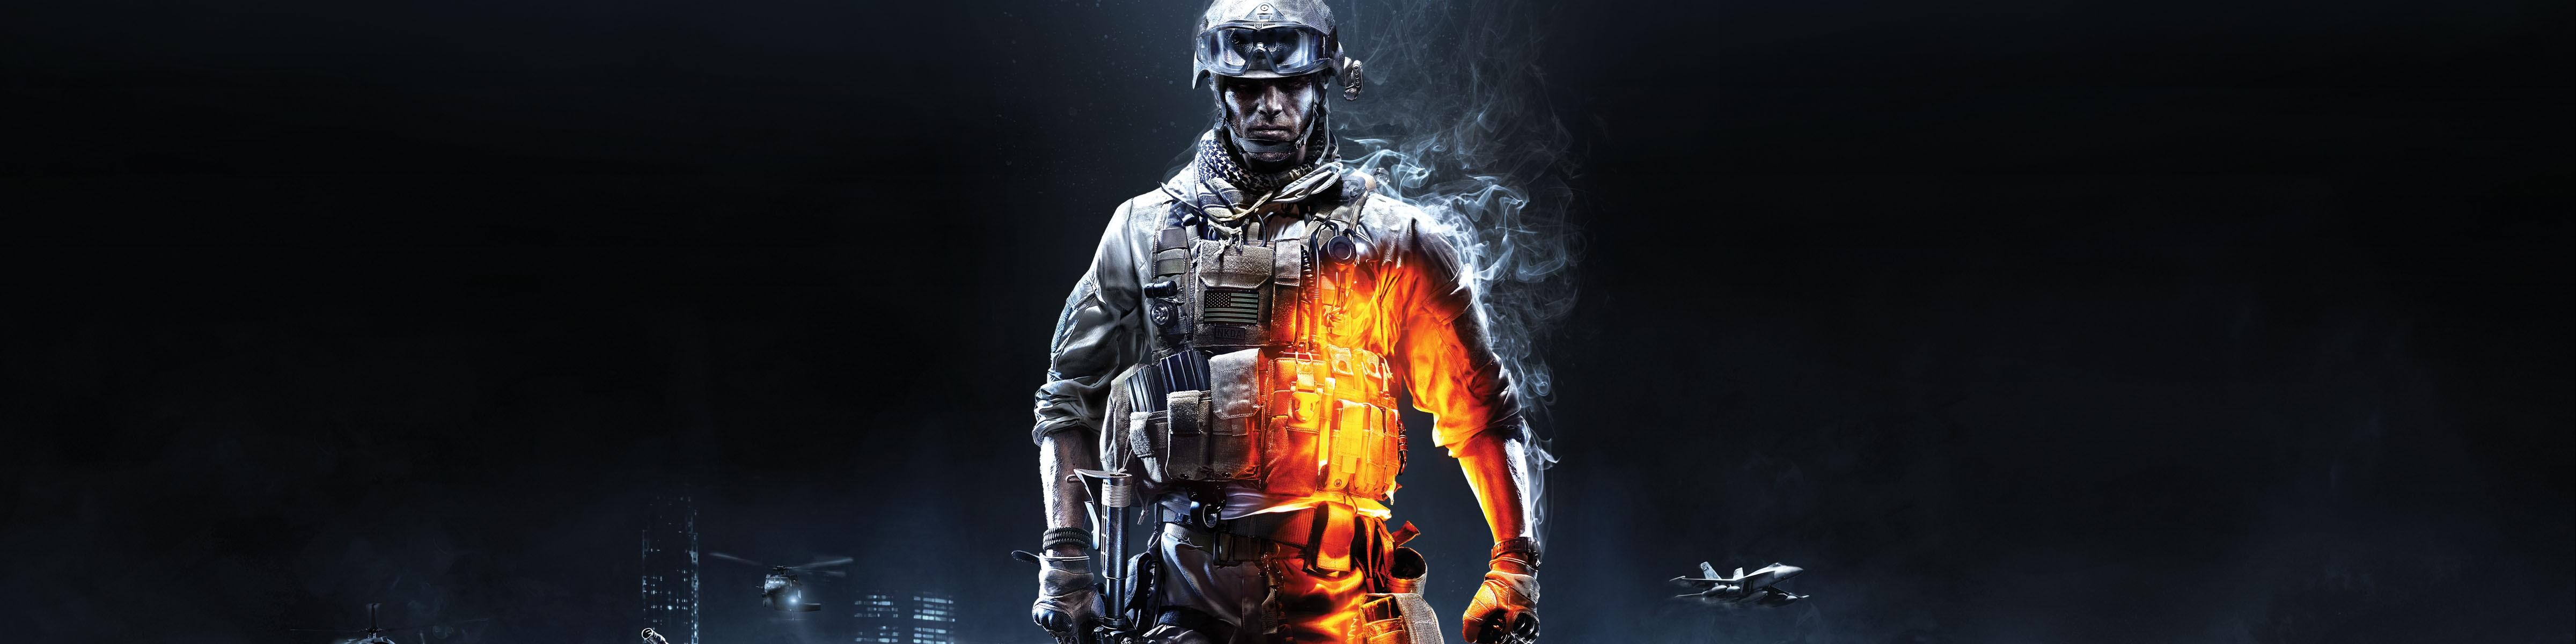 Battlefield 3™ per PC | Origin